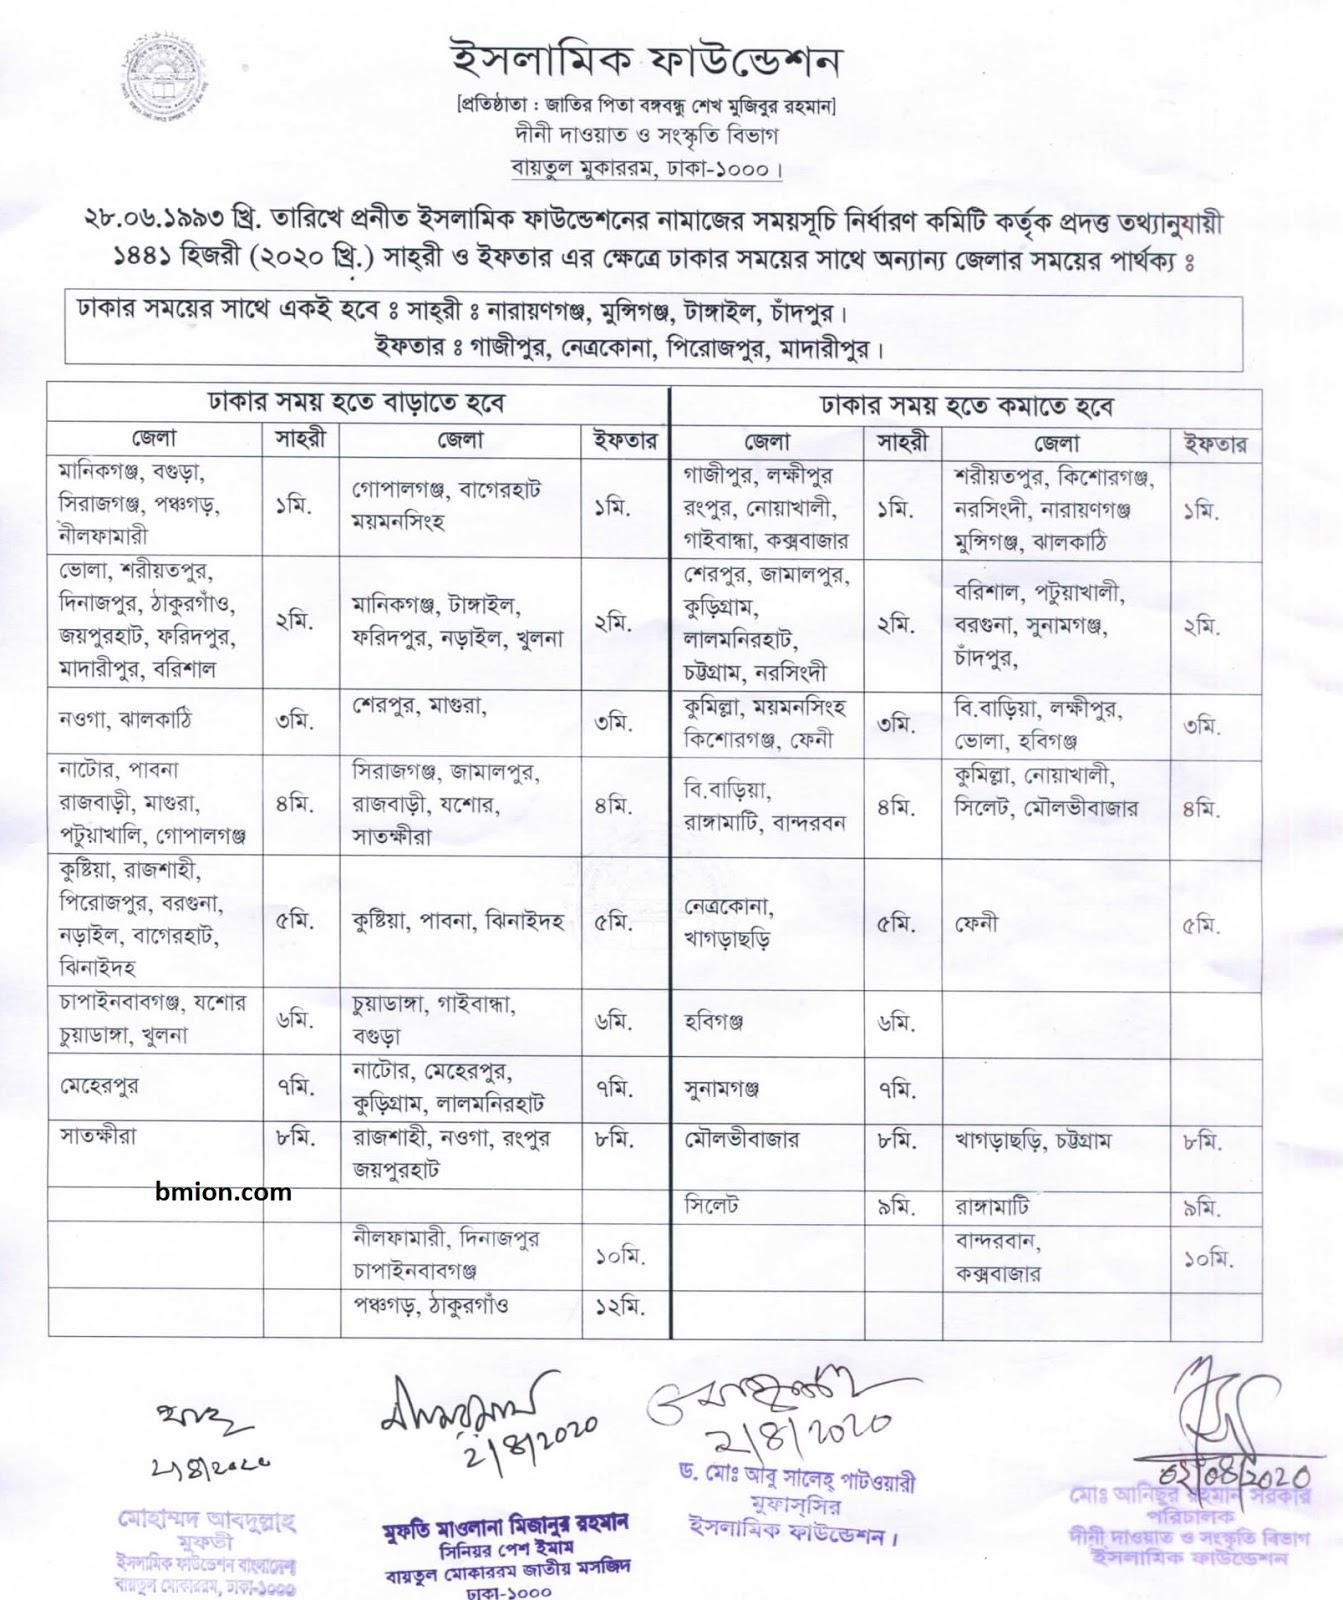 Sehri-Iftaar-Timings-Ramadan-1441-bd-bangladesh-dhaka-chittagong-sylhet-barishal-khulna-rajshahi-rangpur-mymenshing